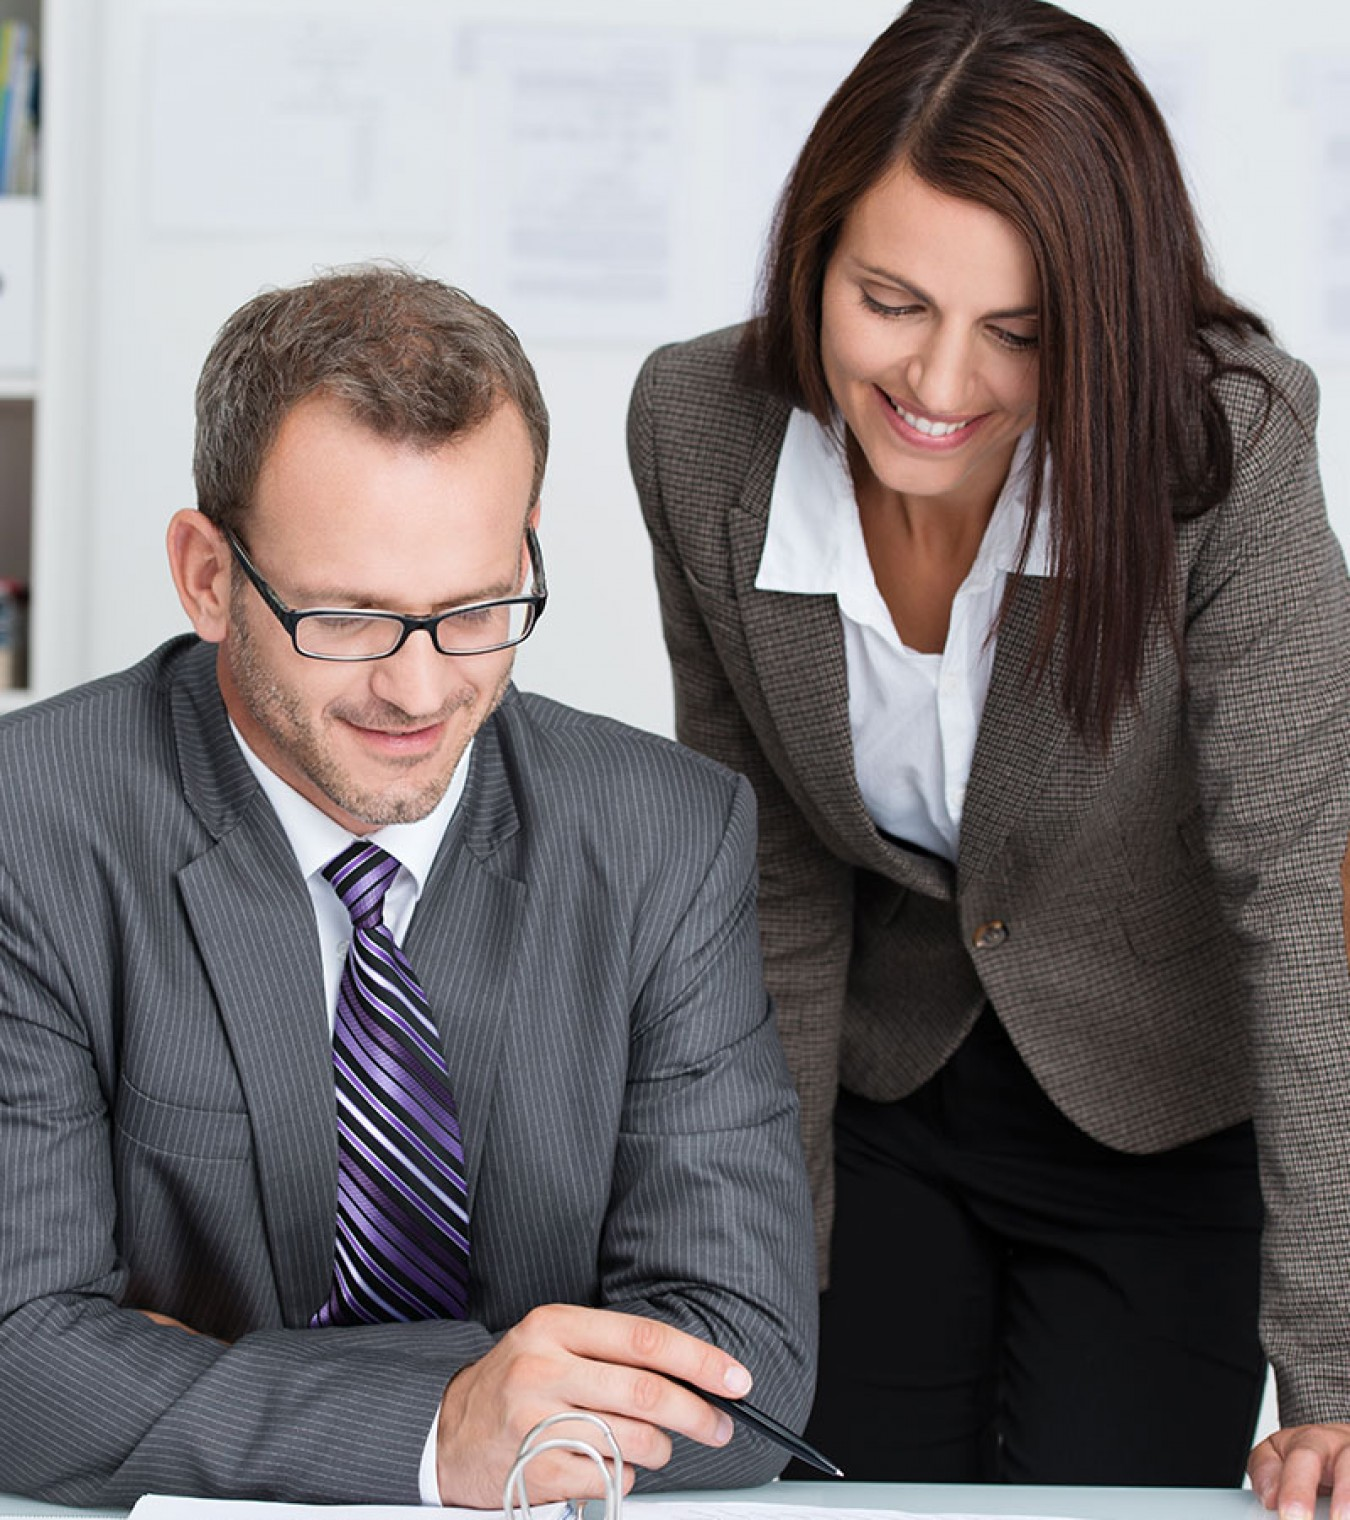 Management Advanced Apprenticeship Level 3 - testimonial